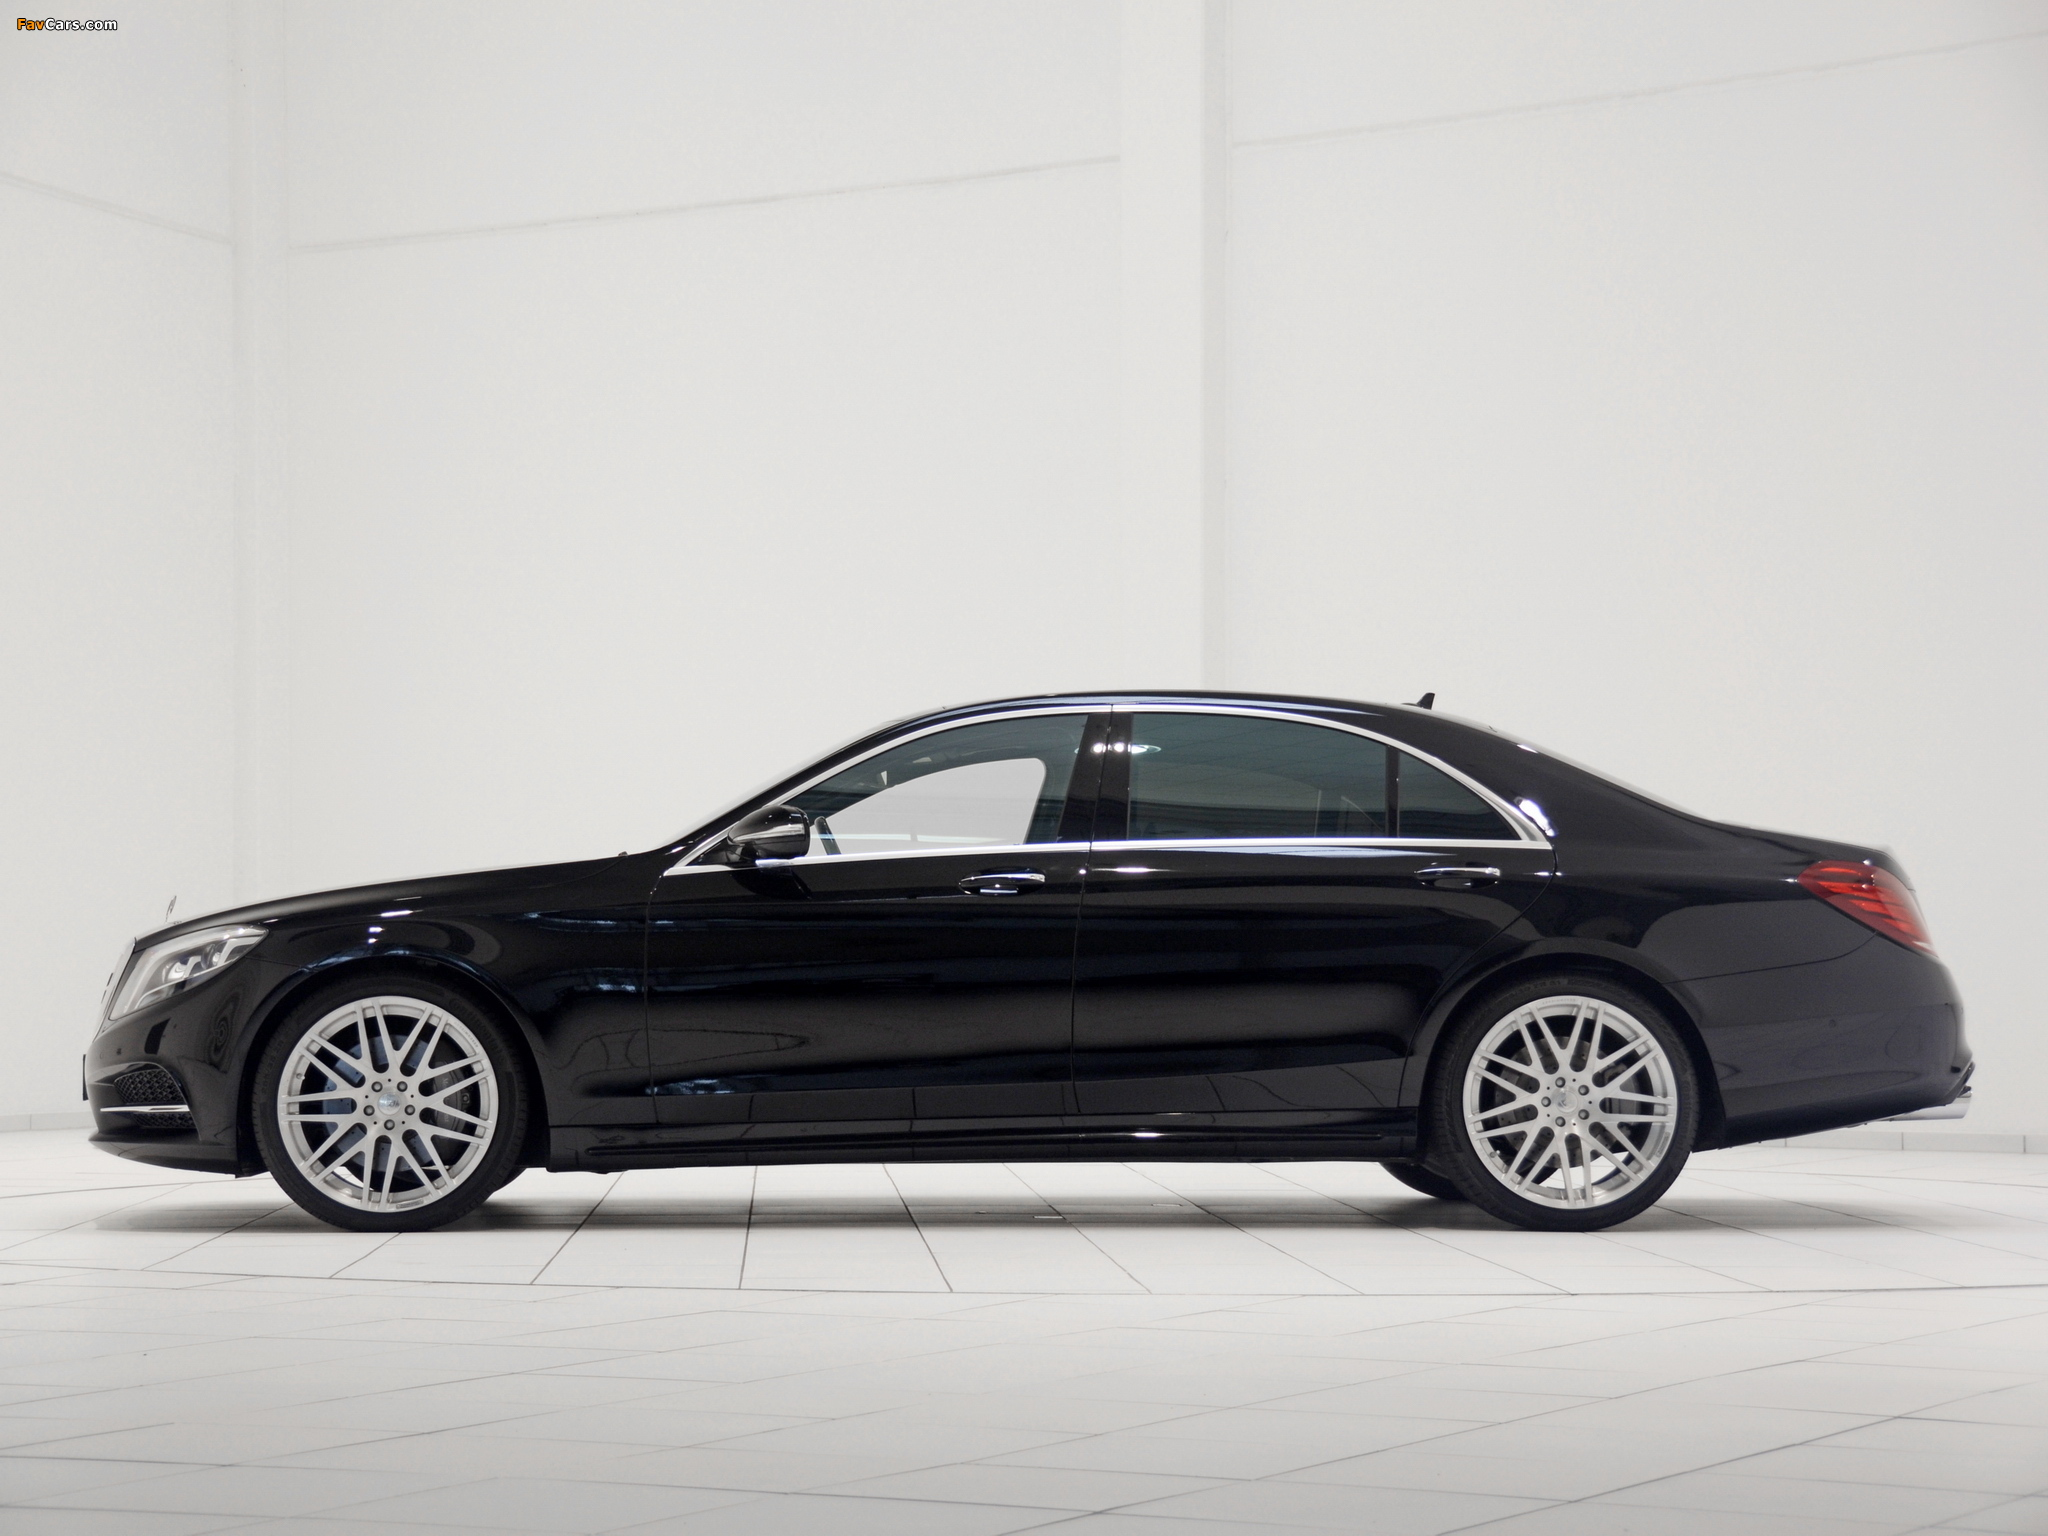 Brabus Mercedes-Benz S-Klasse (W222) 2013 photos (2048 x 1536)